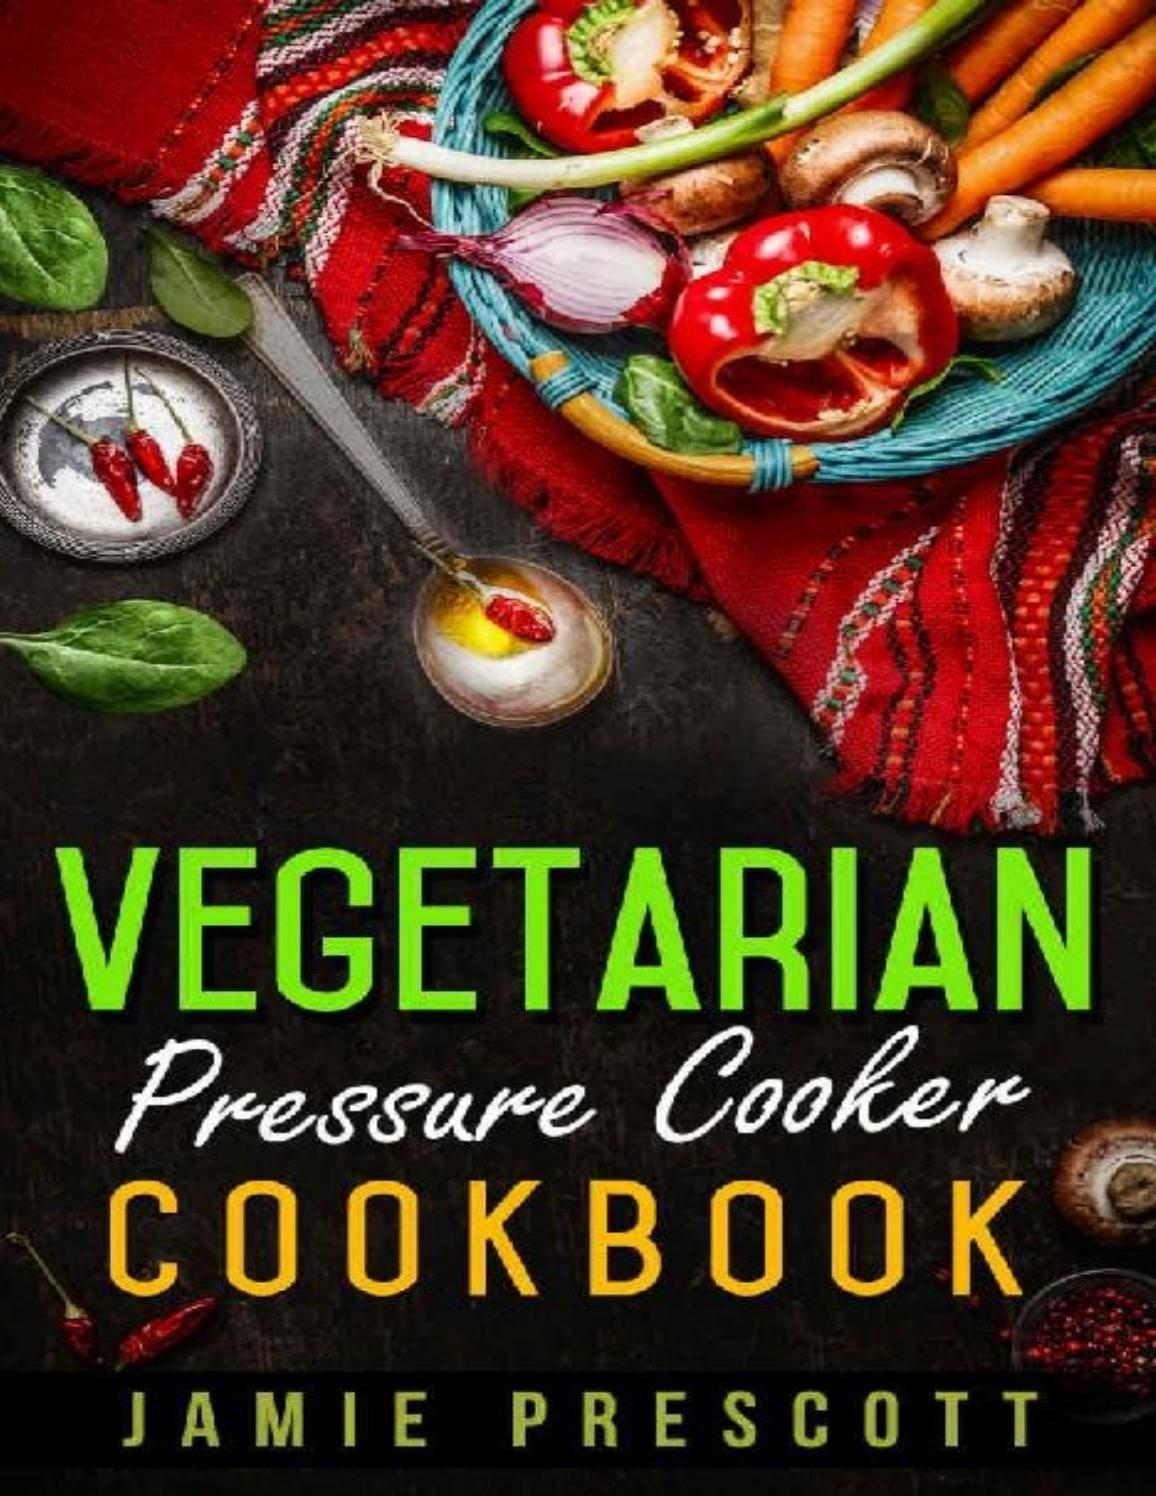 Vegetarian pressure cooker cookbook issuu pdf download my likes vegetarian pressure cooker cookbook issuu pdf download forumfinder Gallery